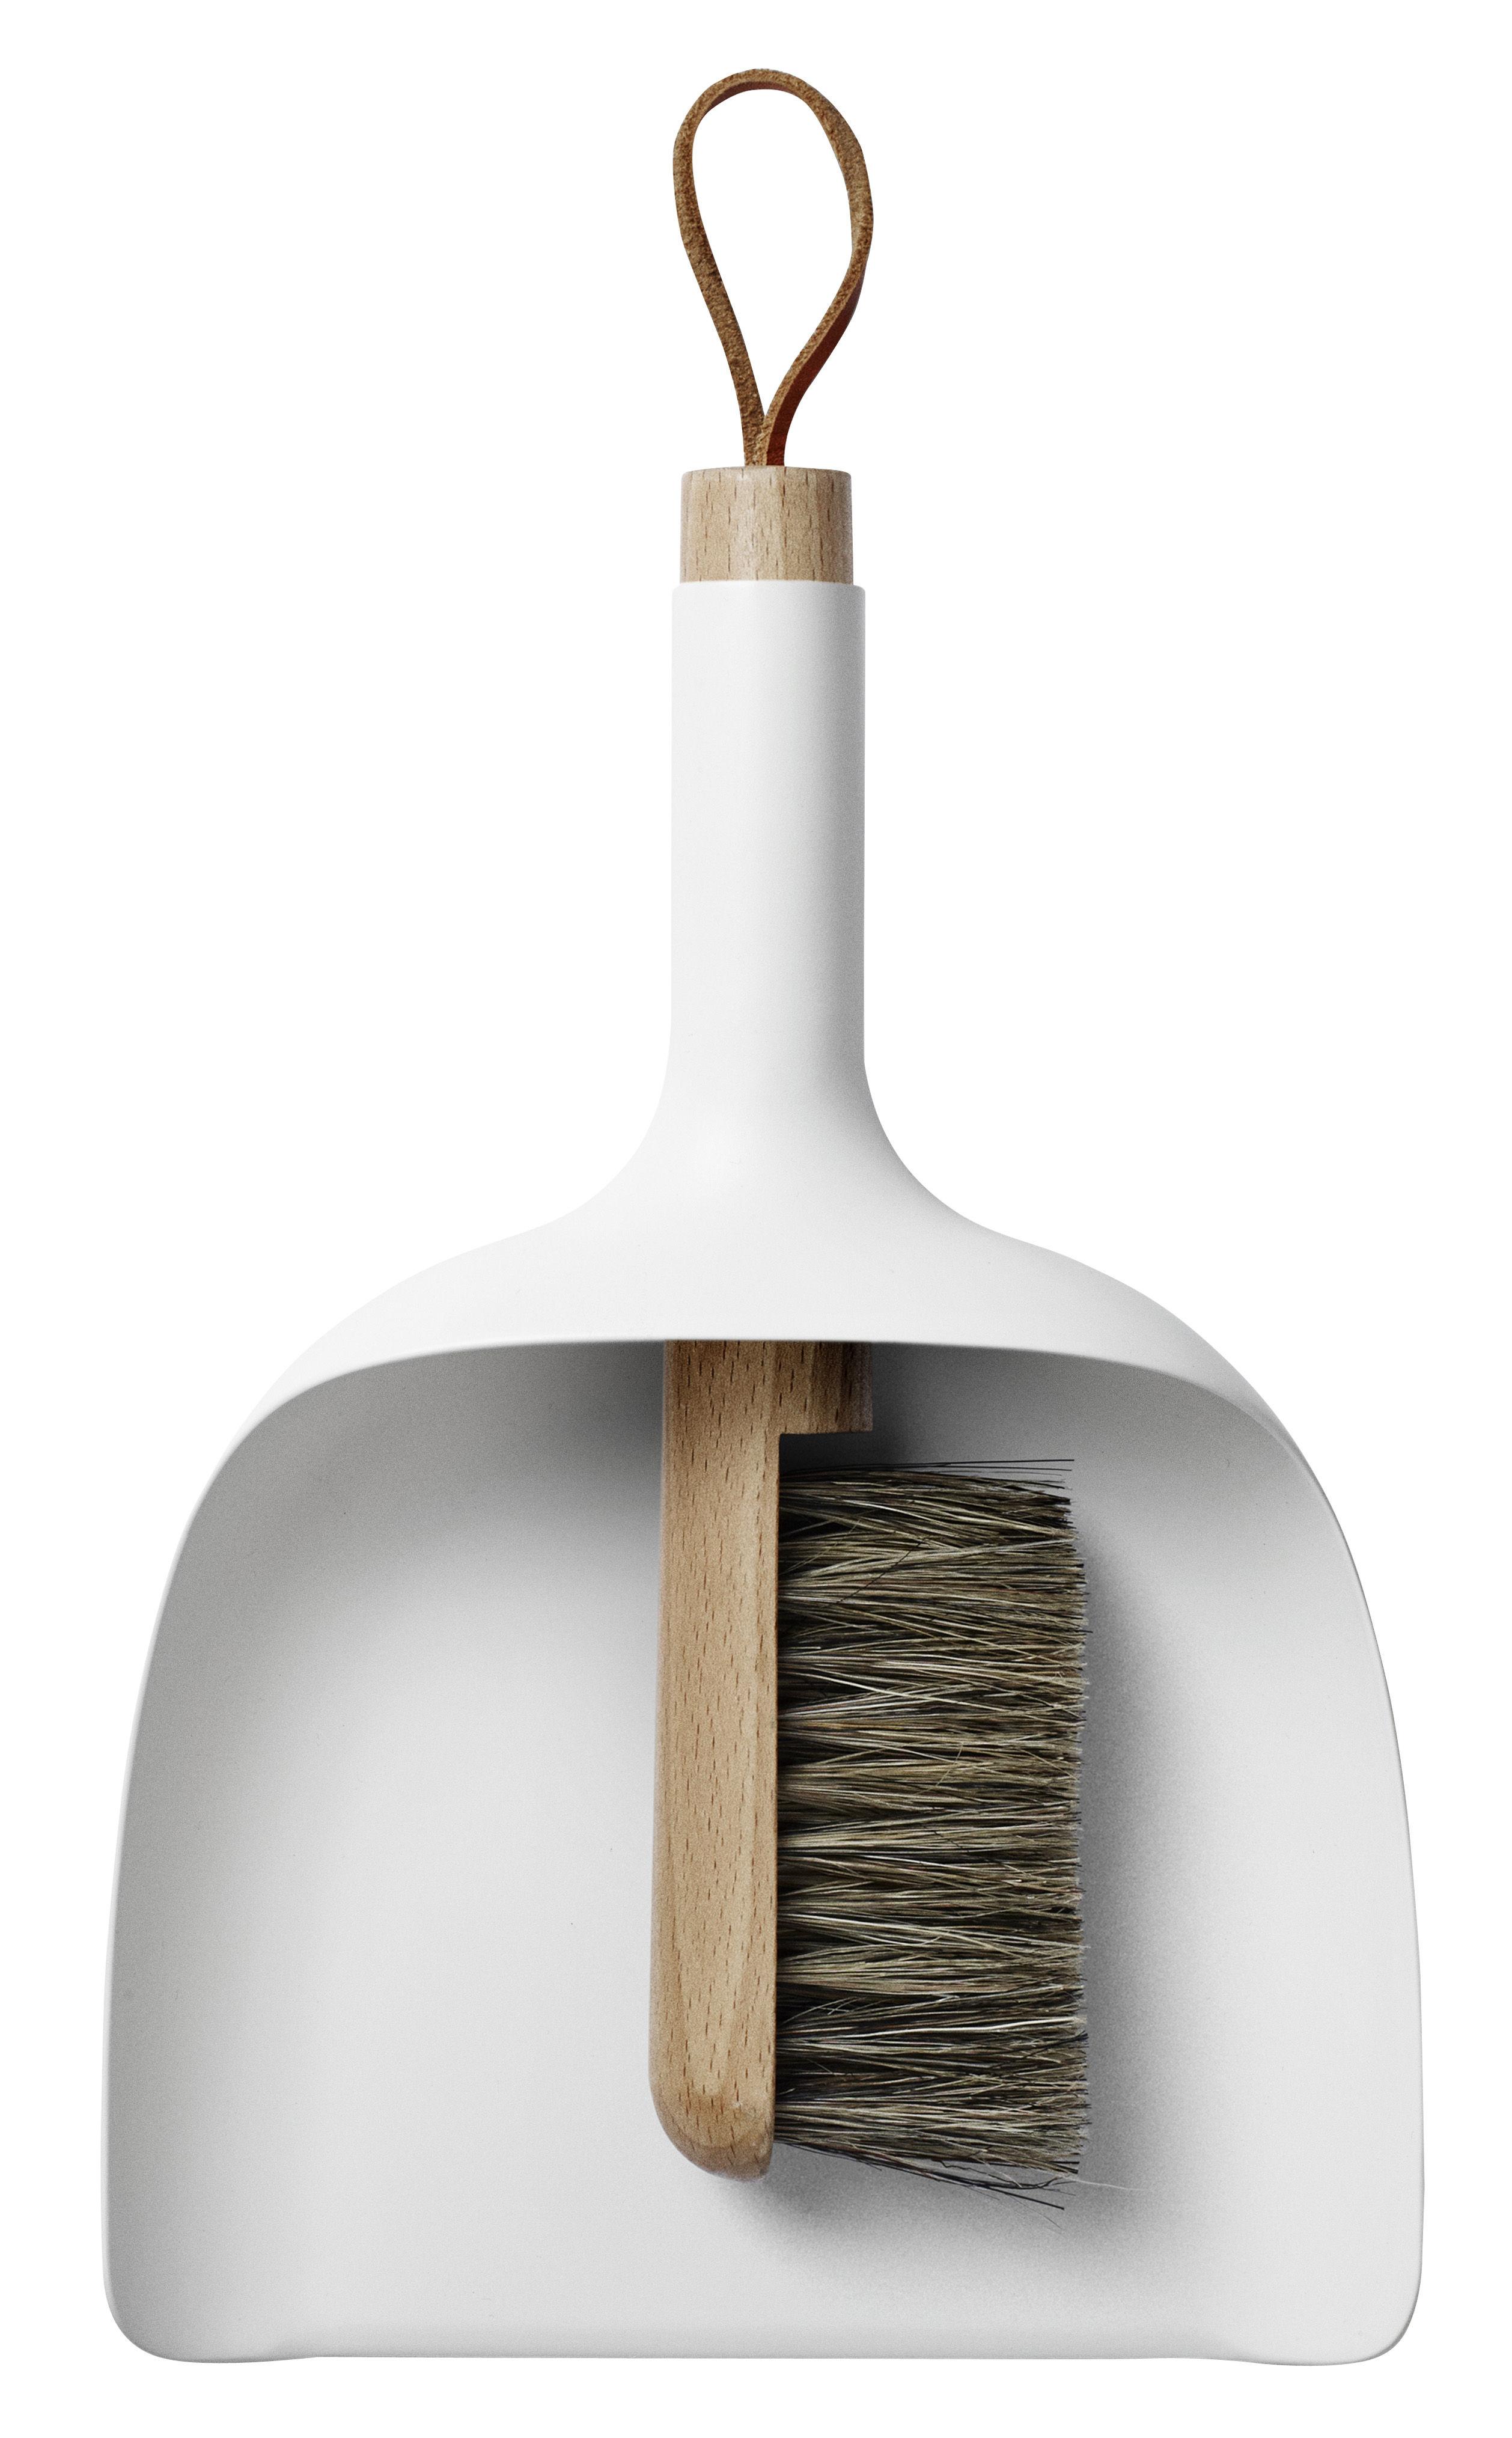 Cucina - Pulizia - Set paletta & spazzola Sweeper and Funnel - Menu - Bianco - Crine di cavallo, Frassino, Plastica